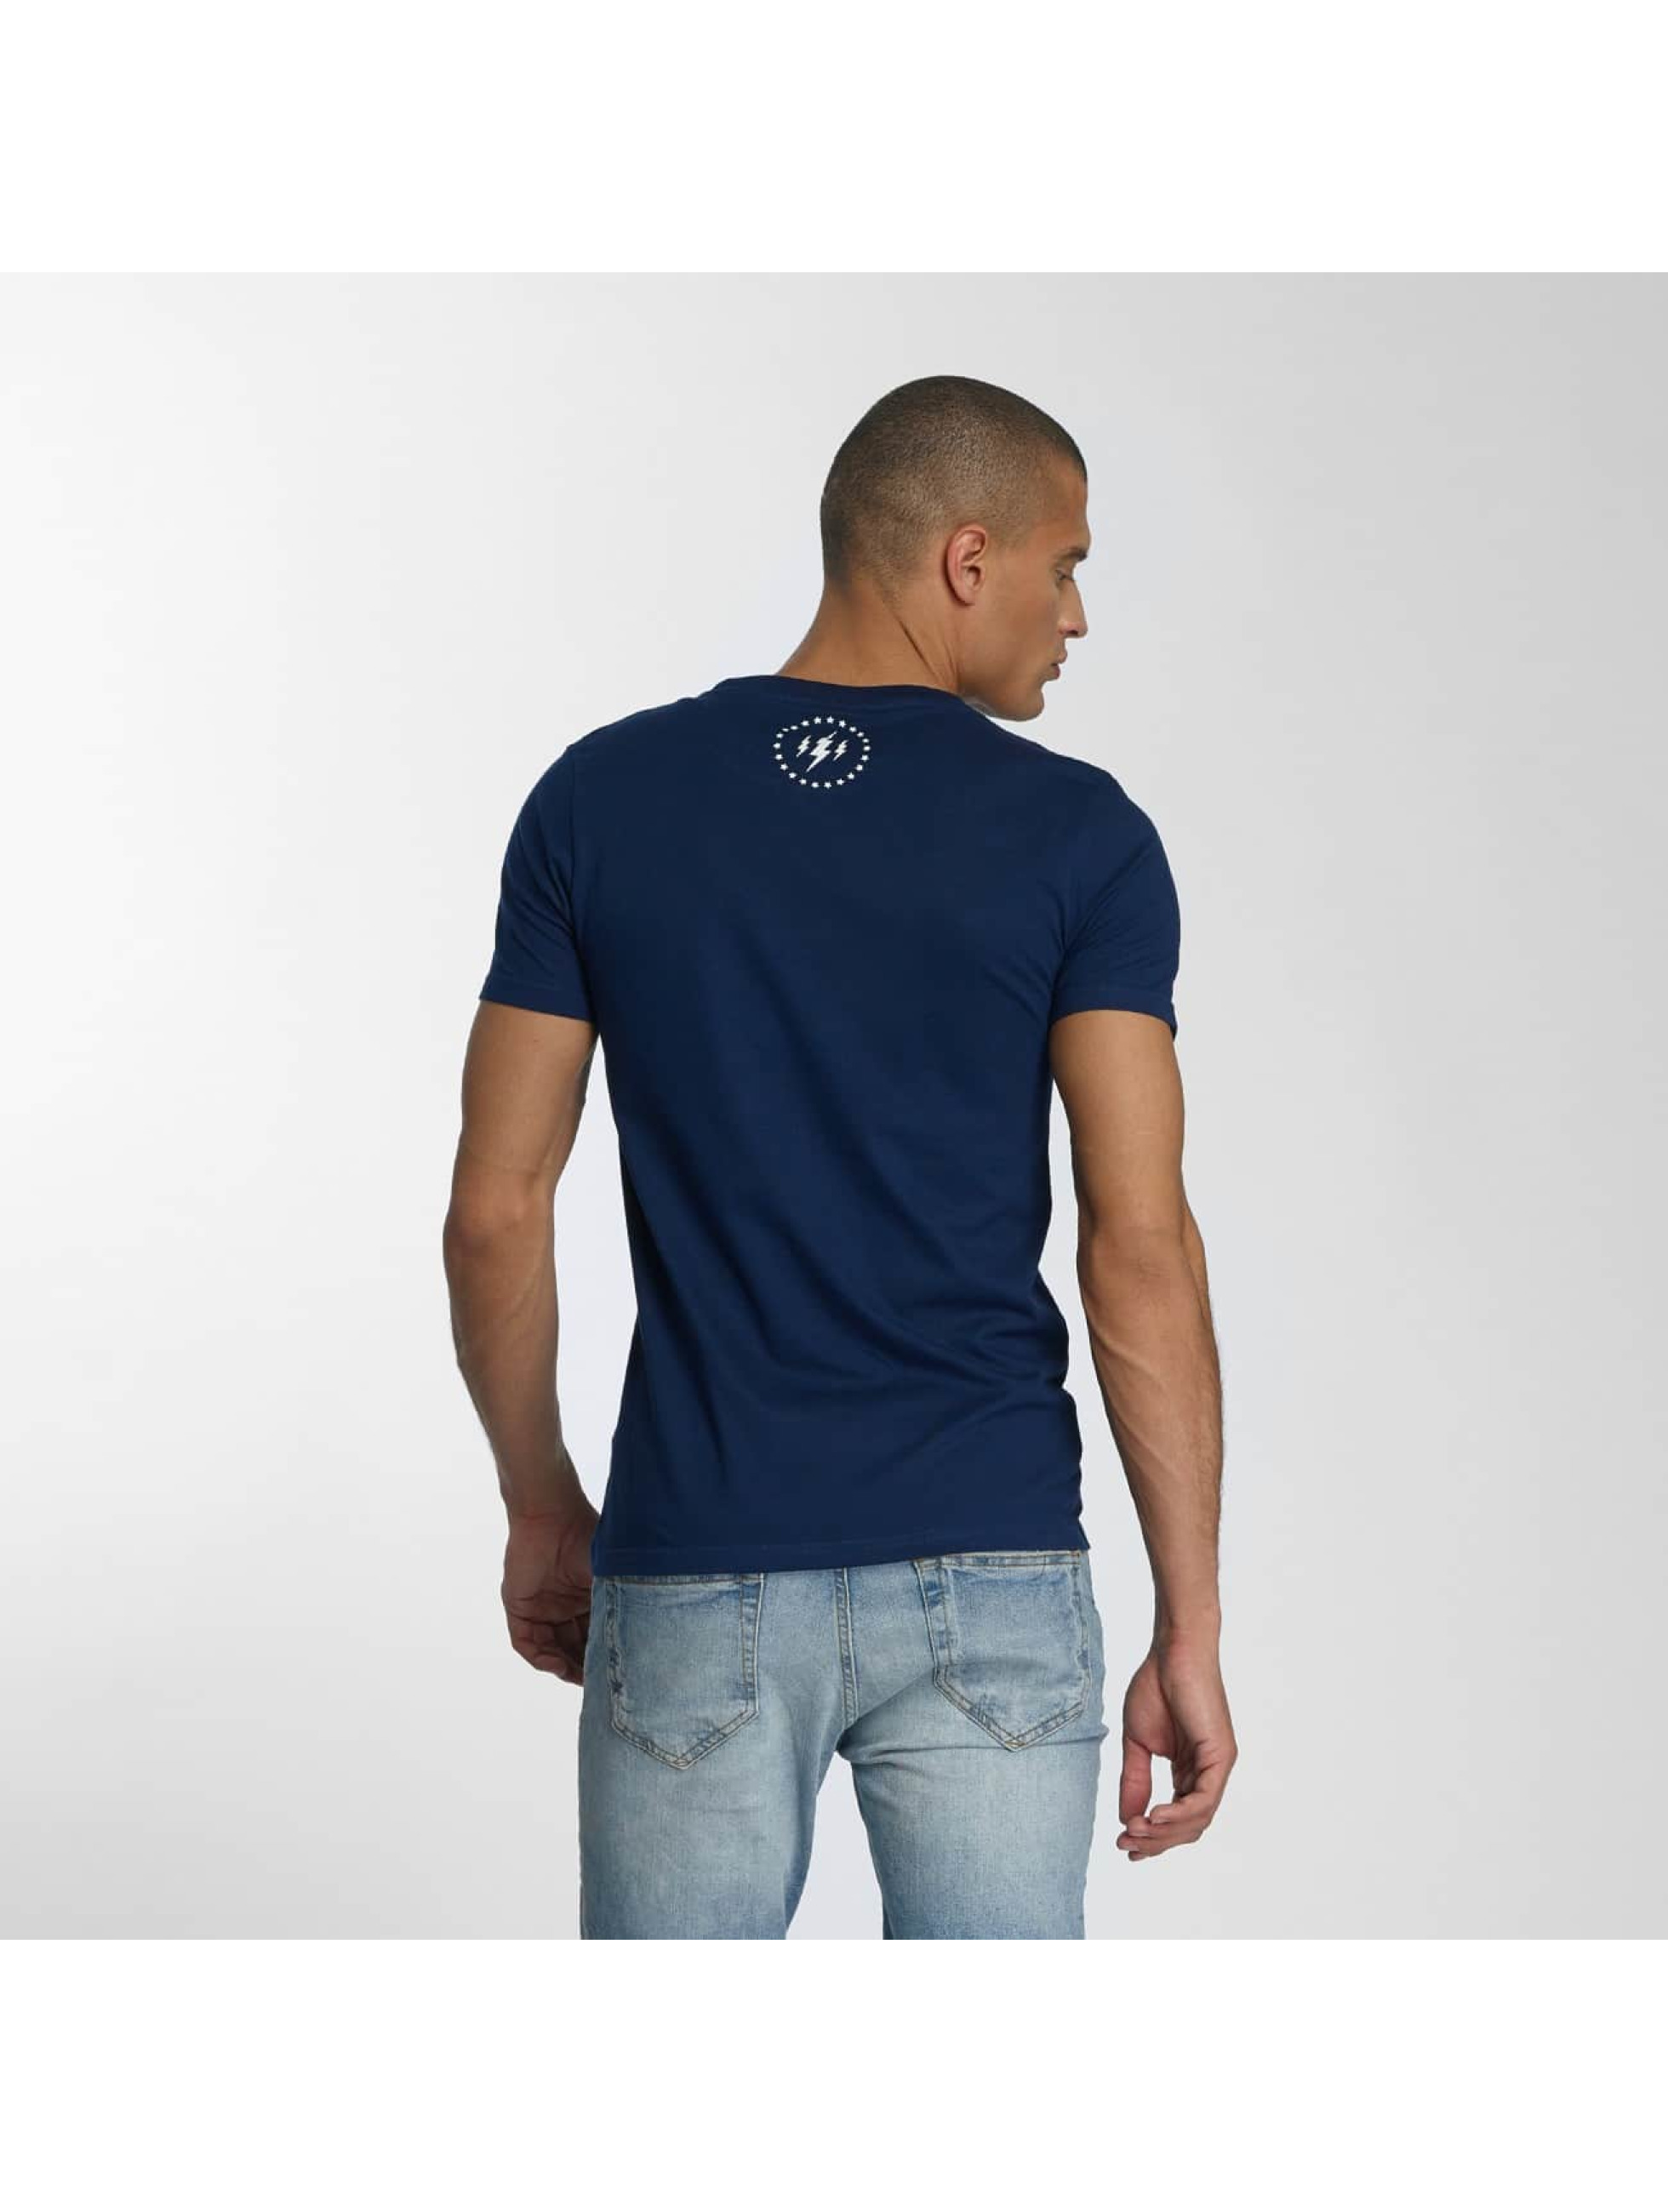 TrueSpin Camiseta 2 azul